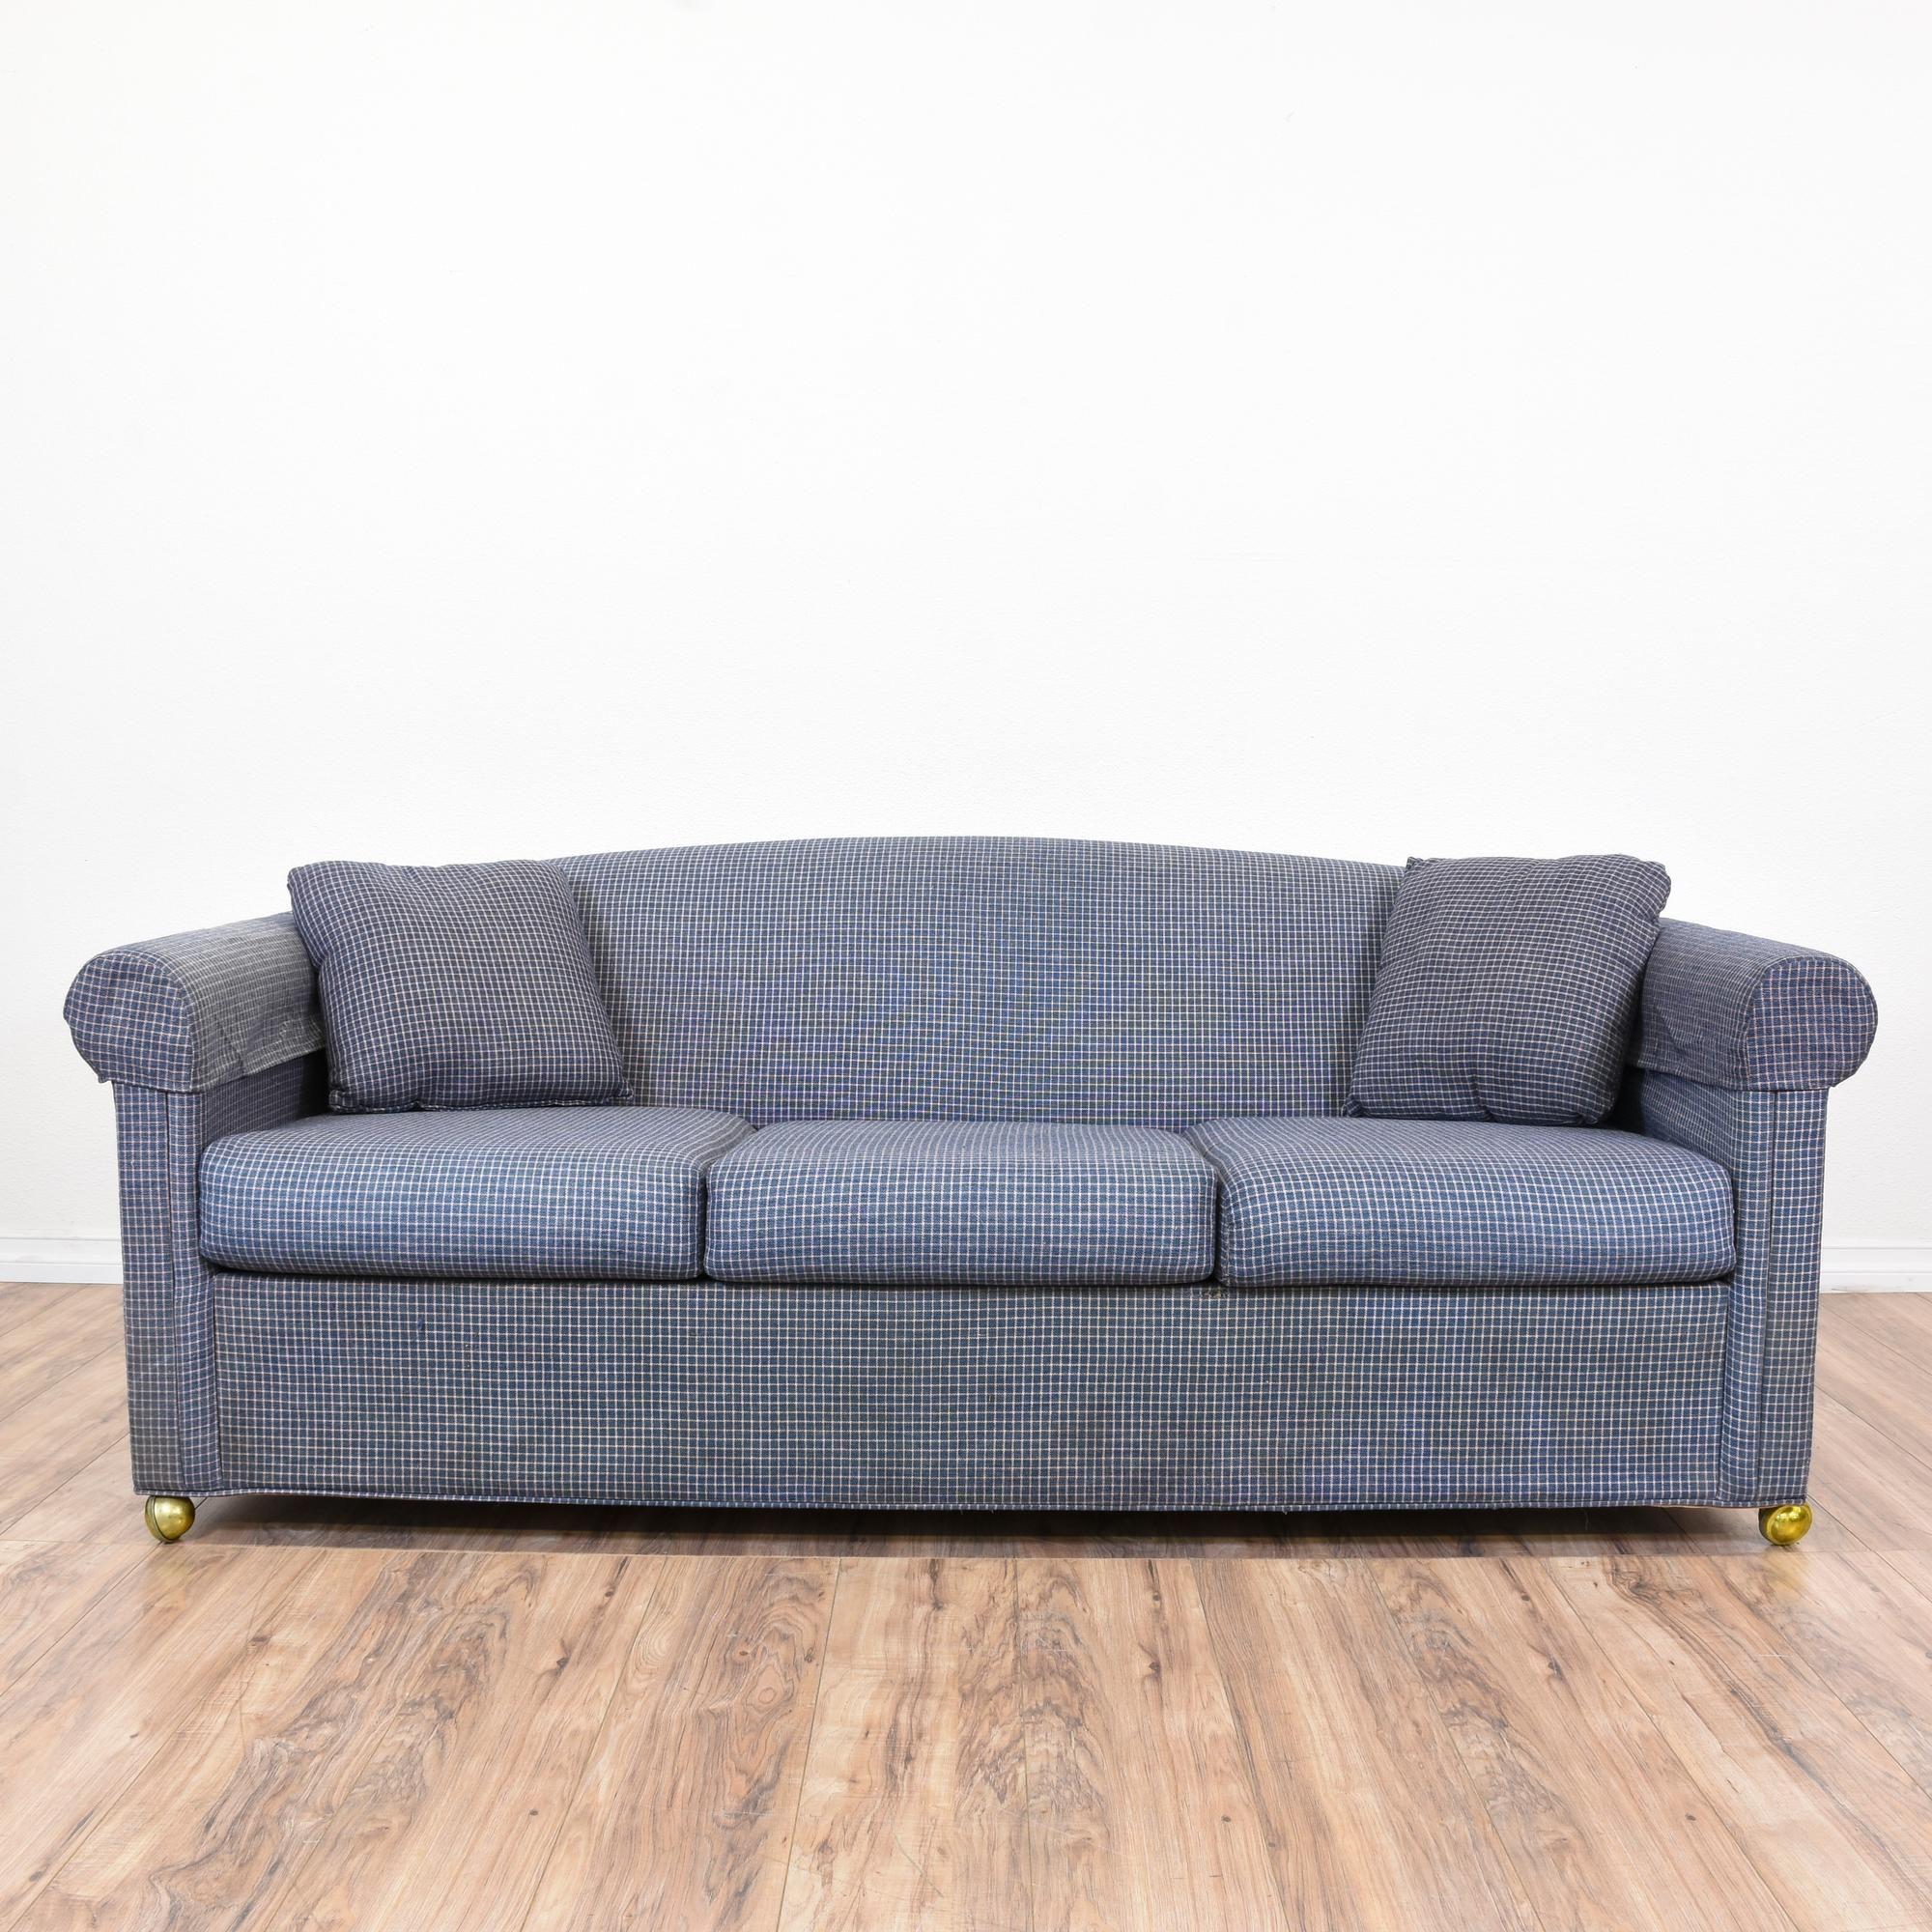 beach print sleeper sofas twin sofa chair target contemporary blue and white